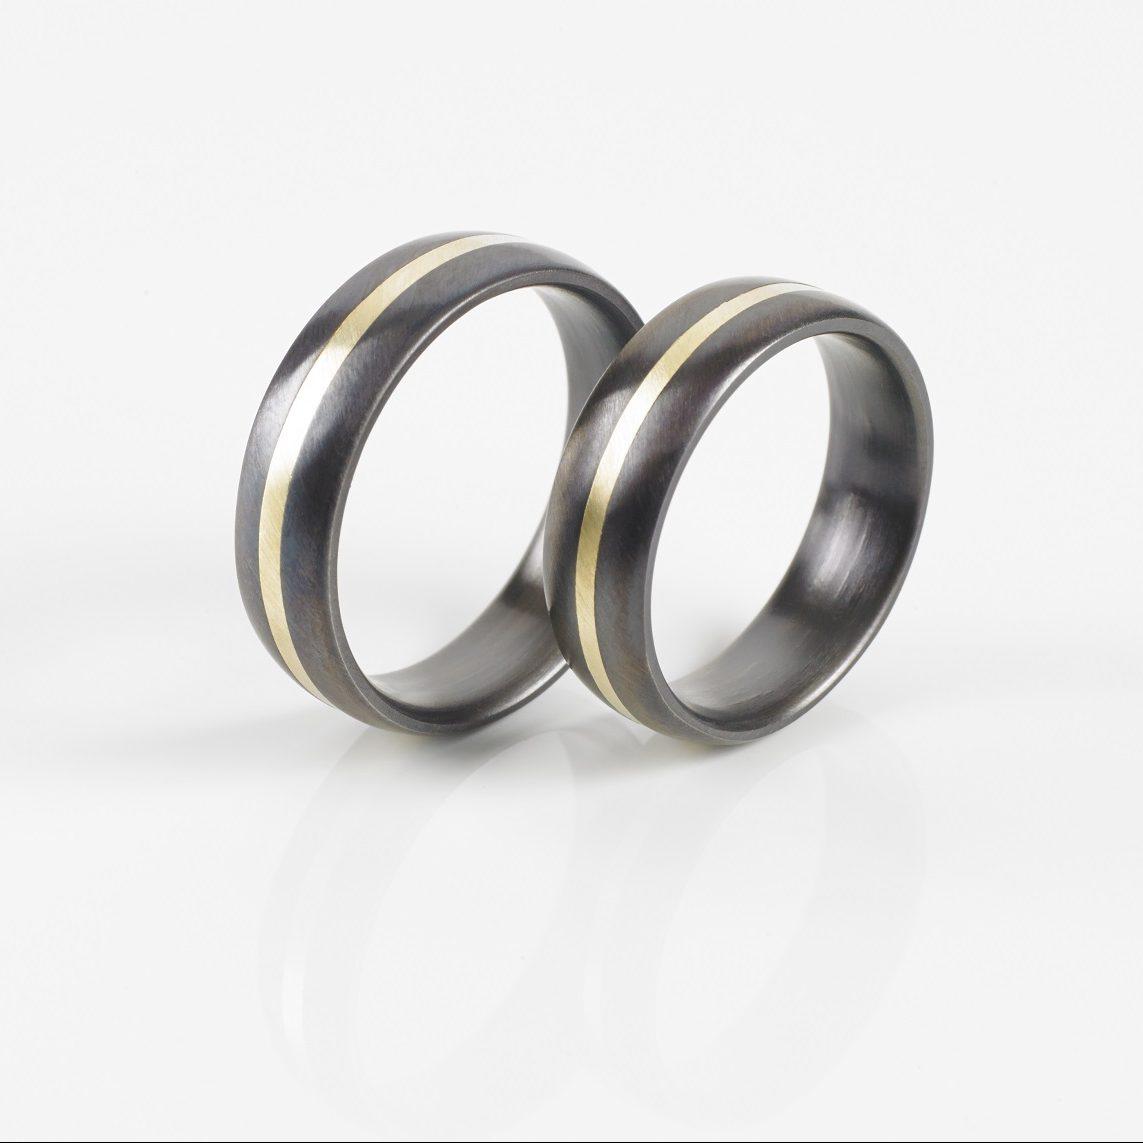 Tantal Ringpaar | Tantal Ehering True Love Collection No:24